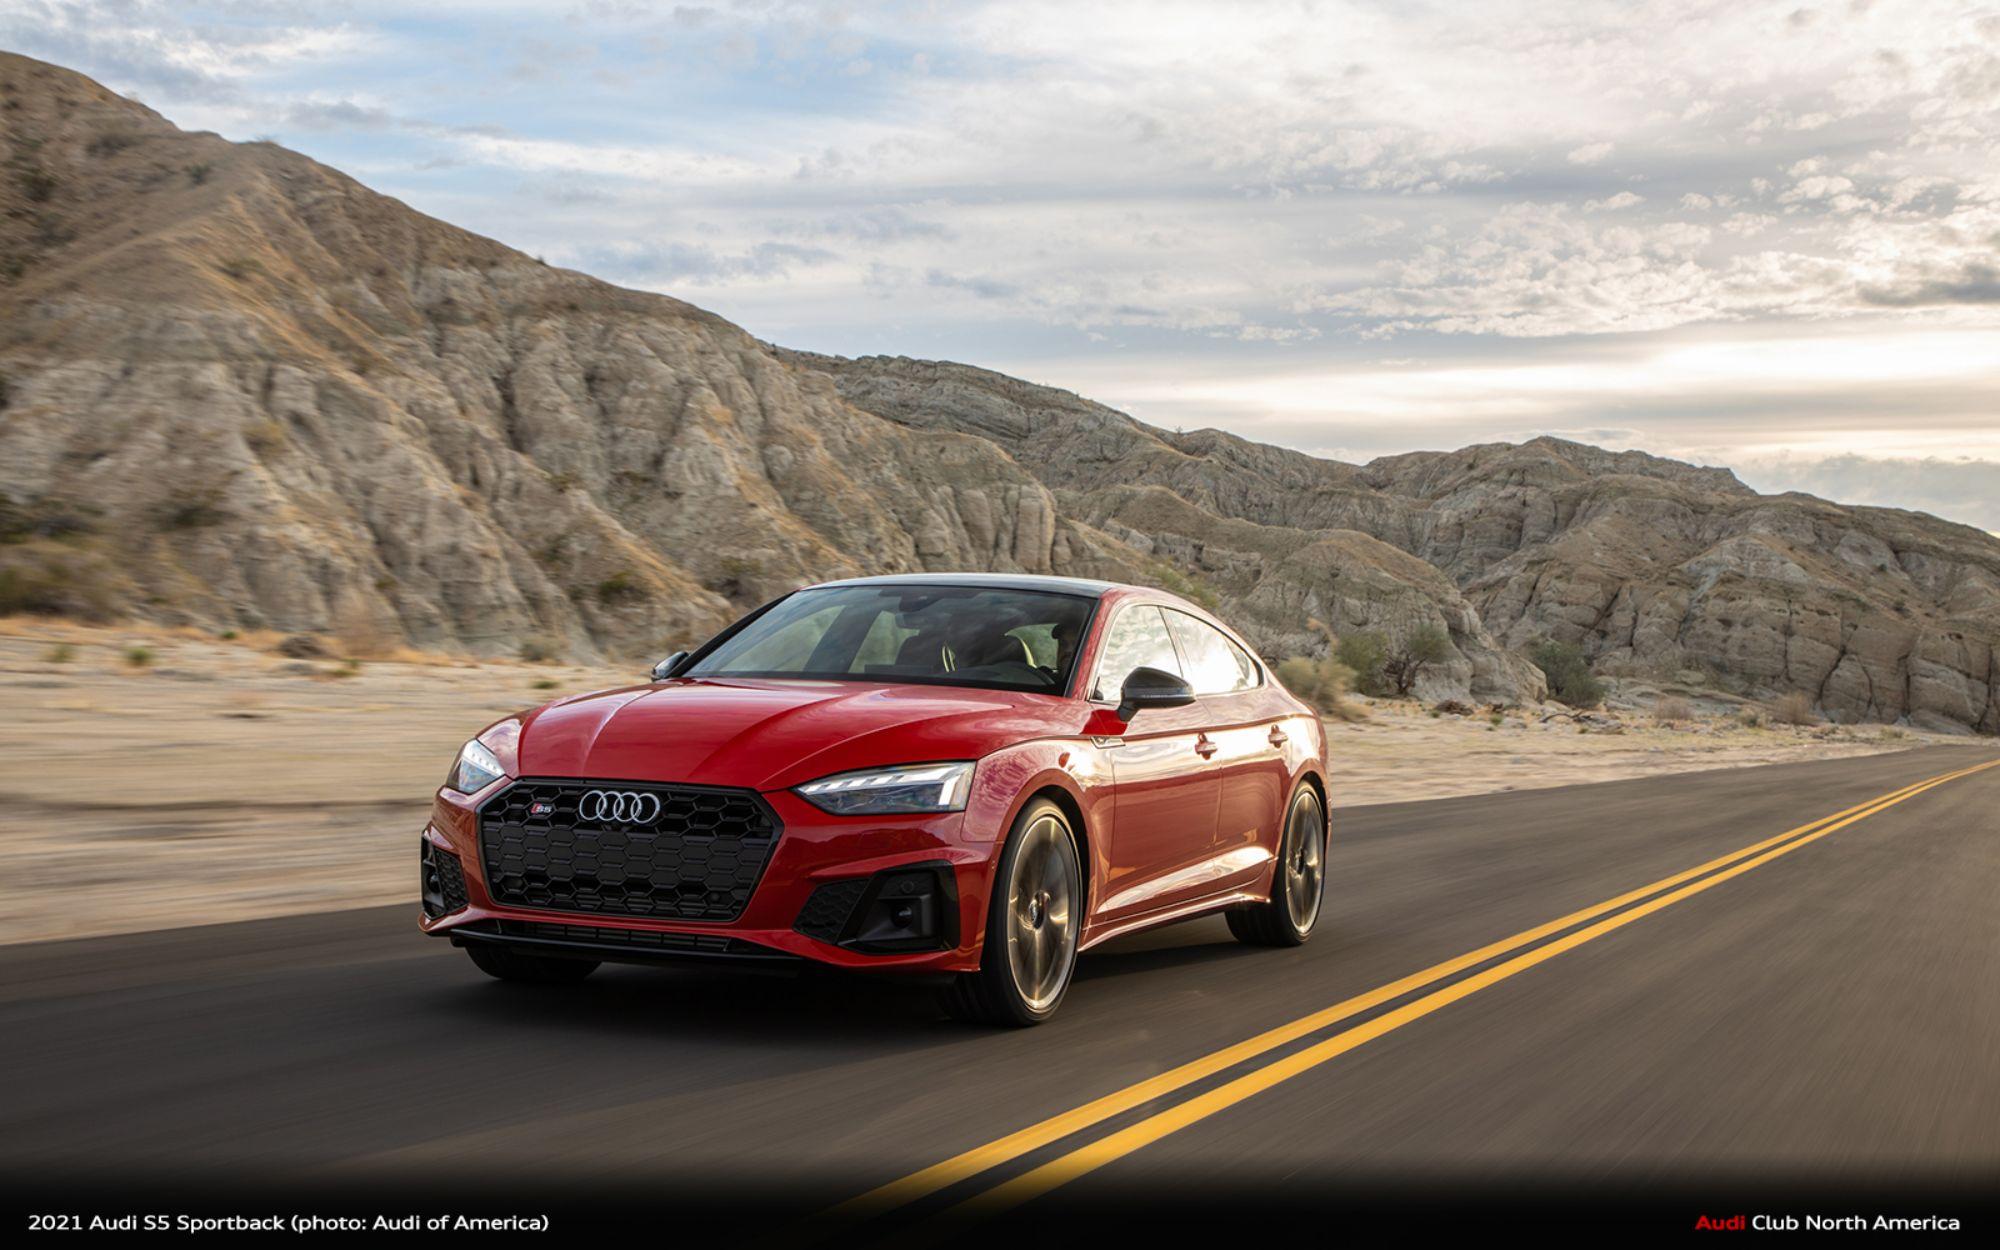 Audi of America Announces Full 2021 Model Year Updates